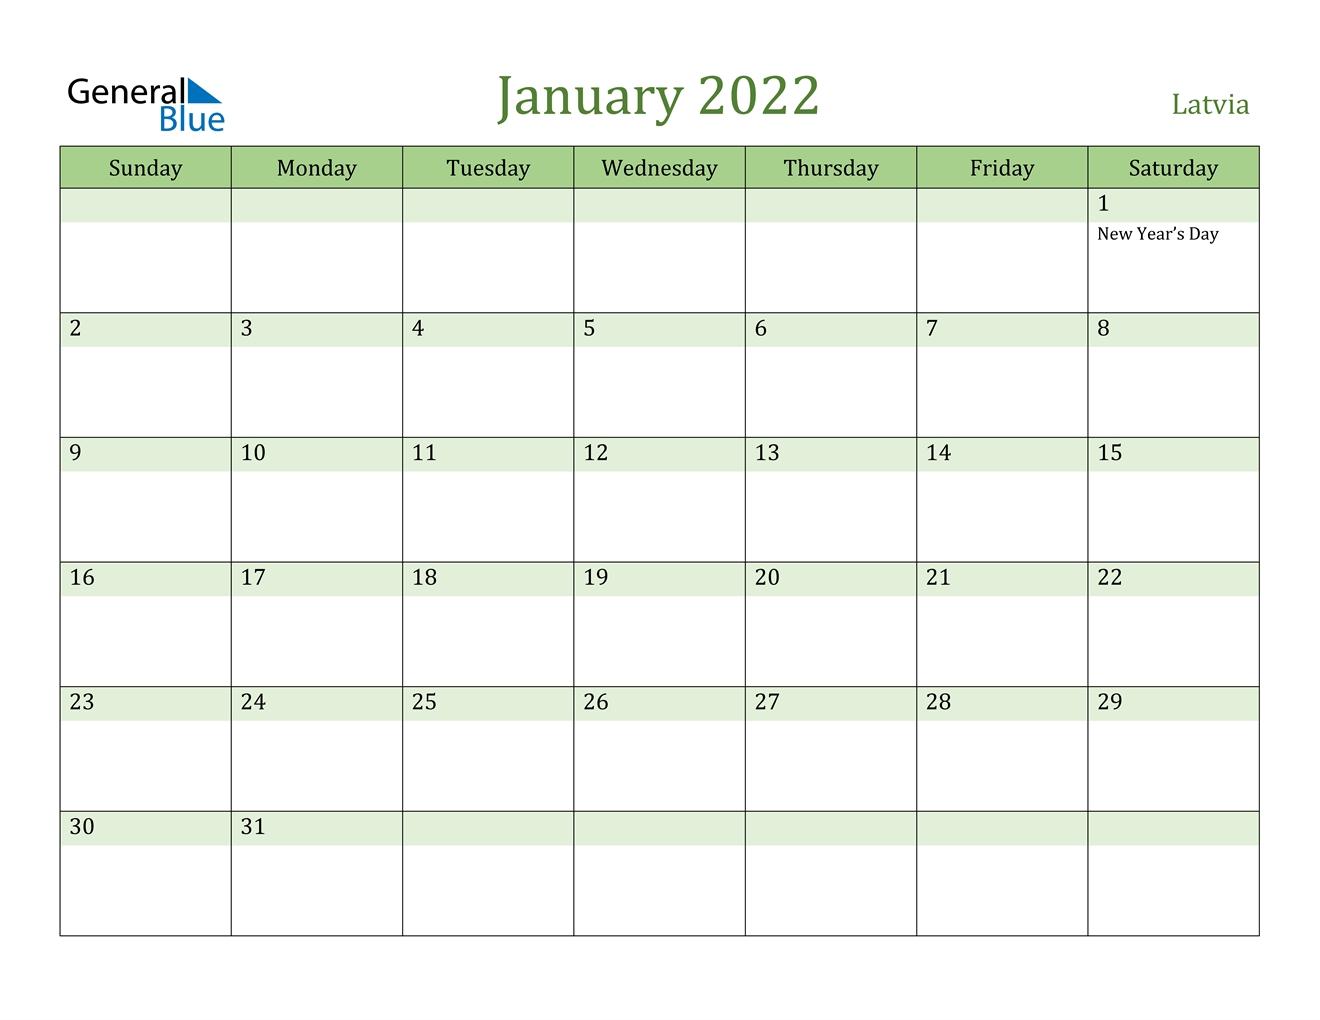 latvia january 2022 calendar with holidays::January 2022 calendar with holidays printable